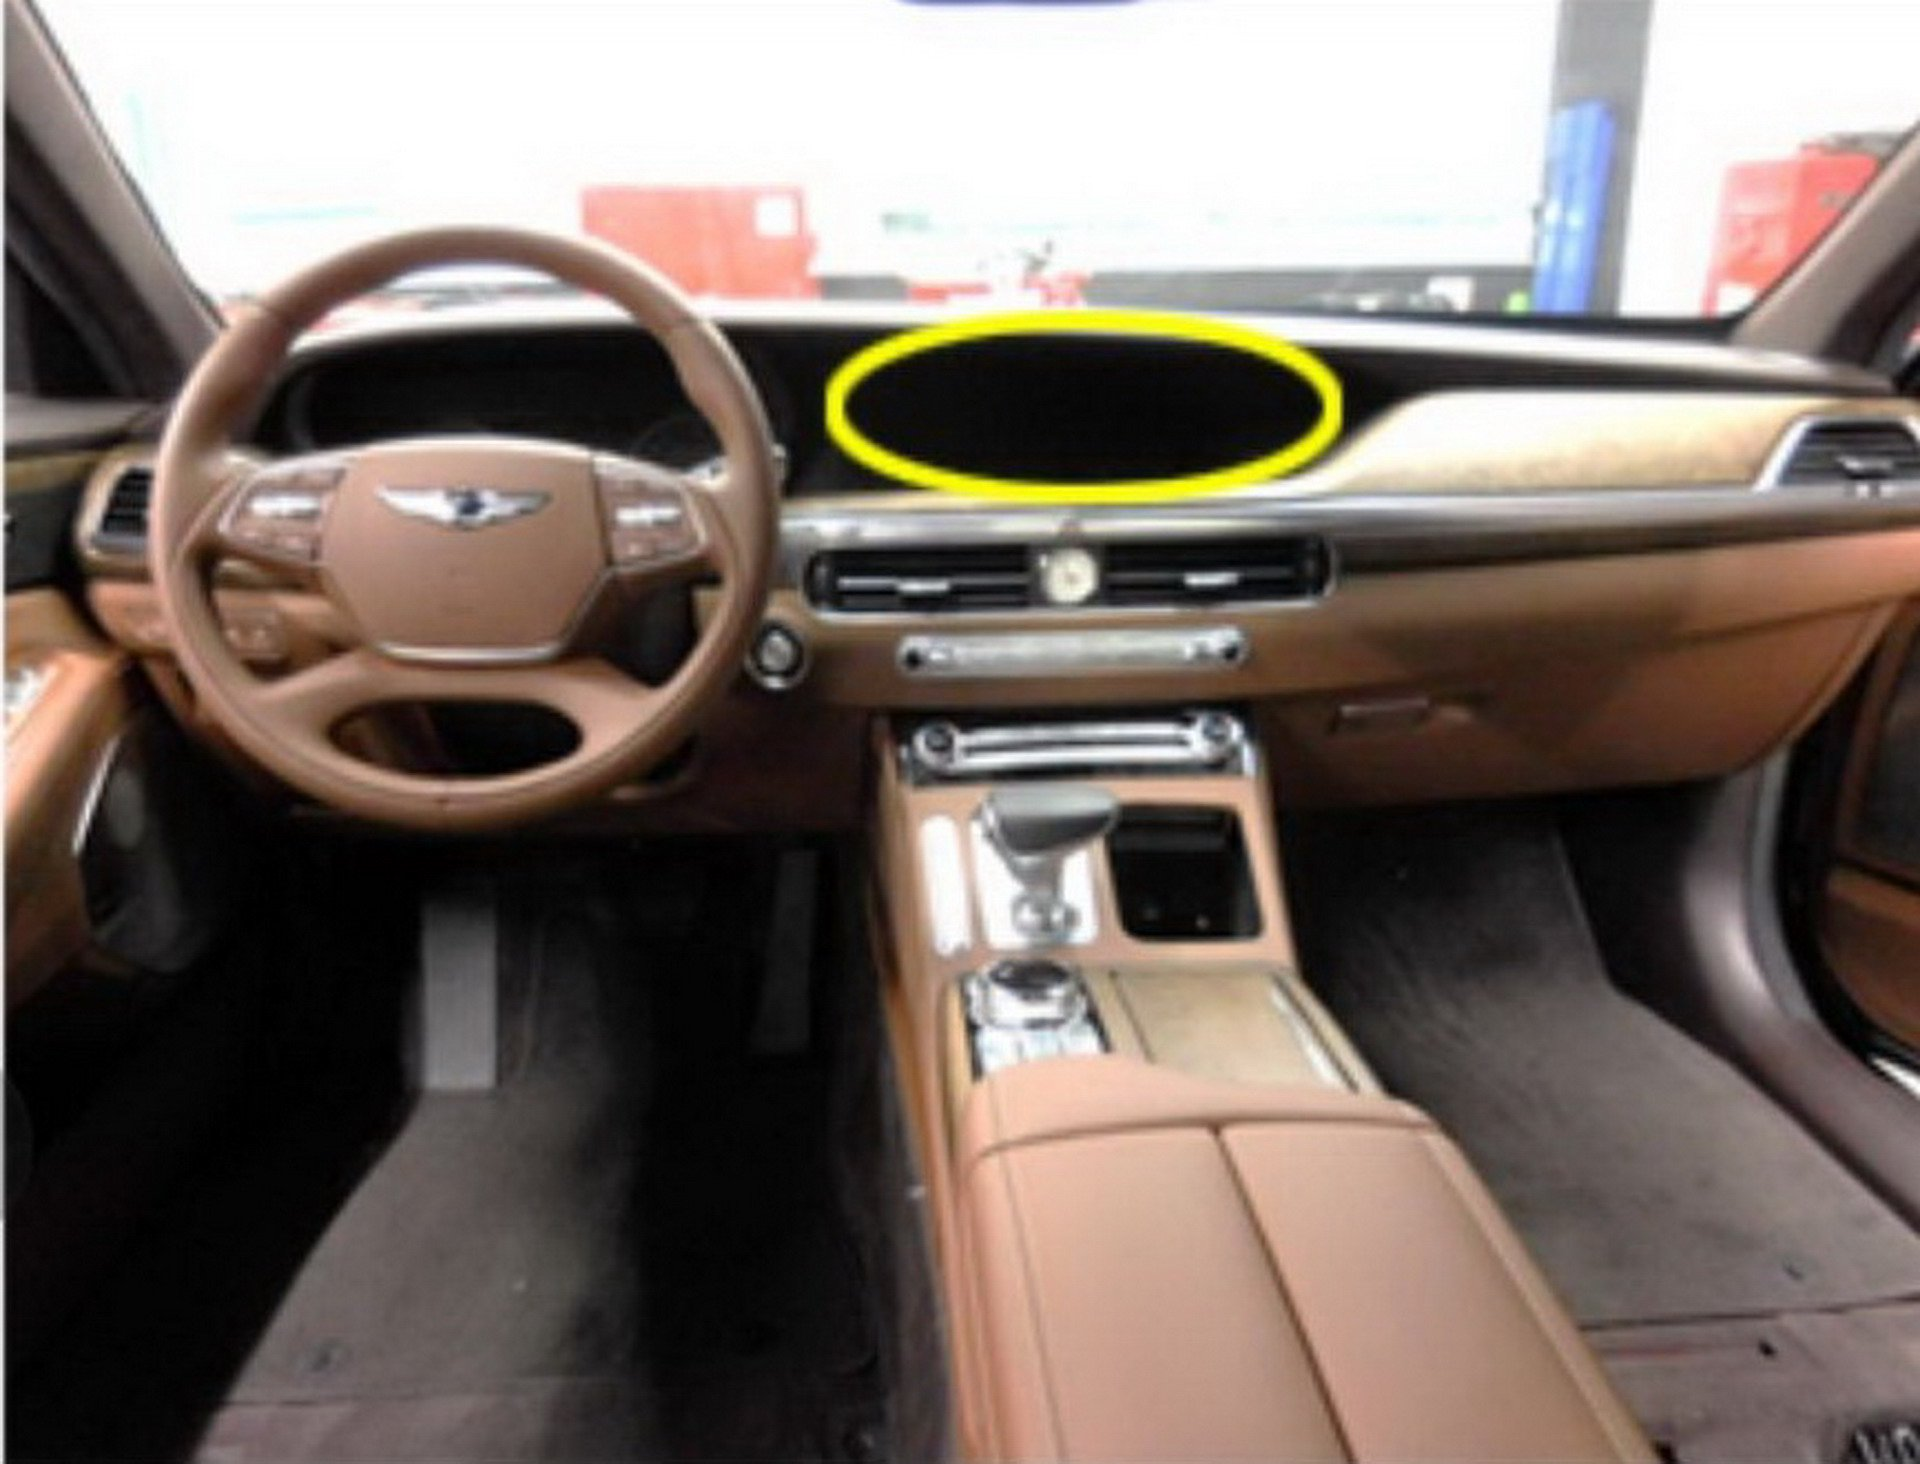 Genesis G90 facelift spy photos (6)